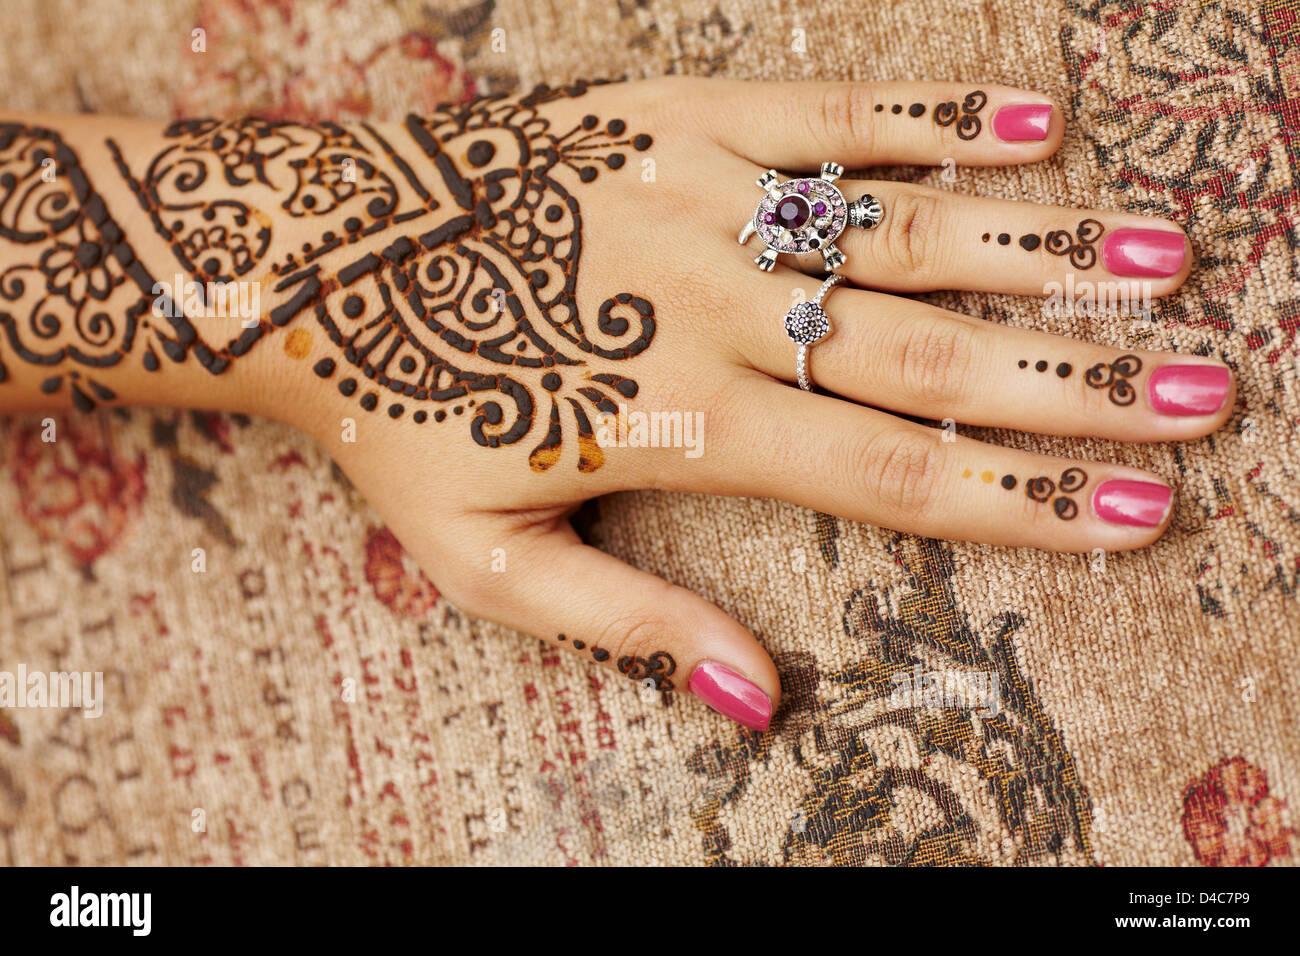 Henna art on woman's hand - Stock Image